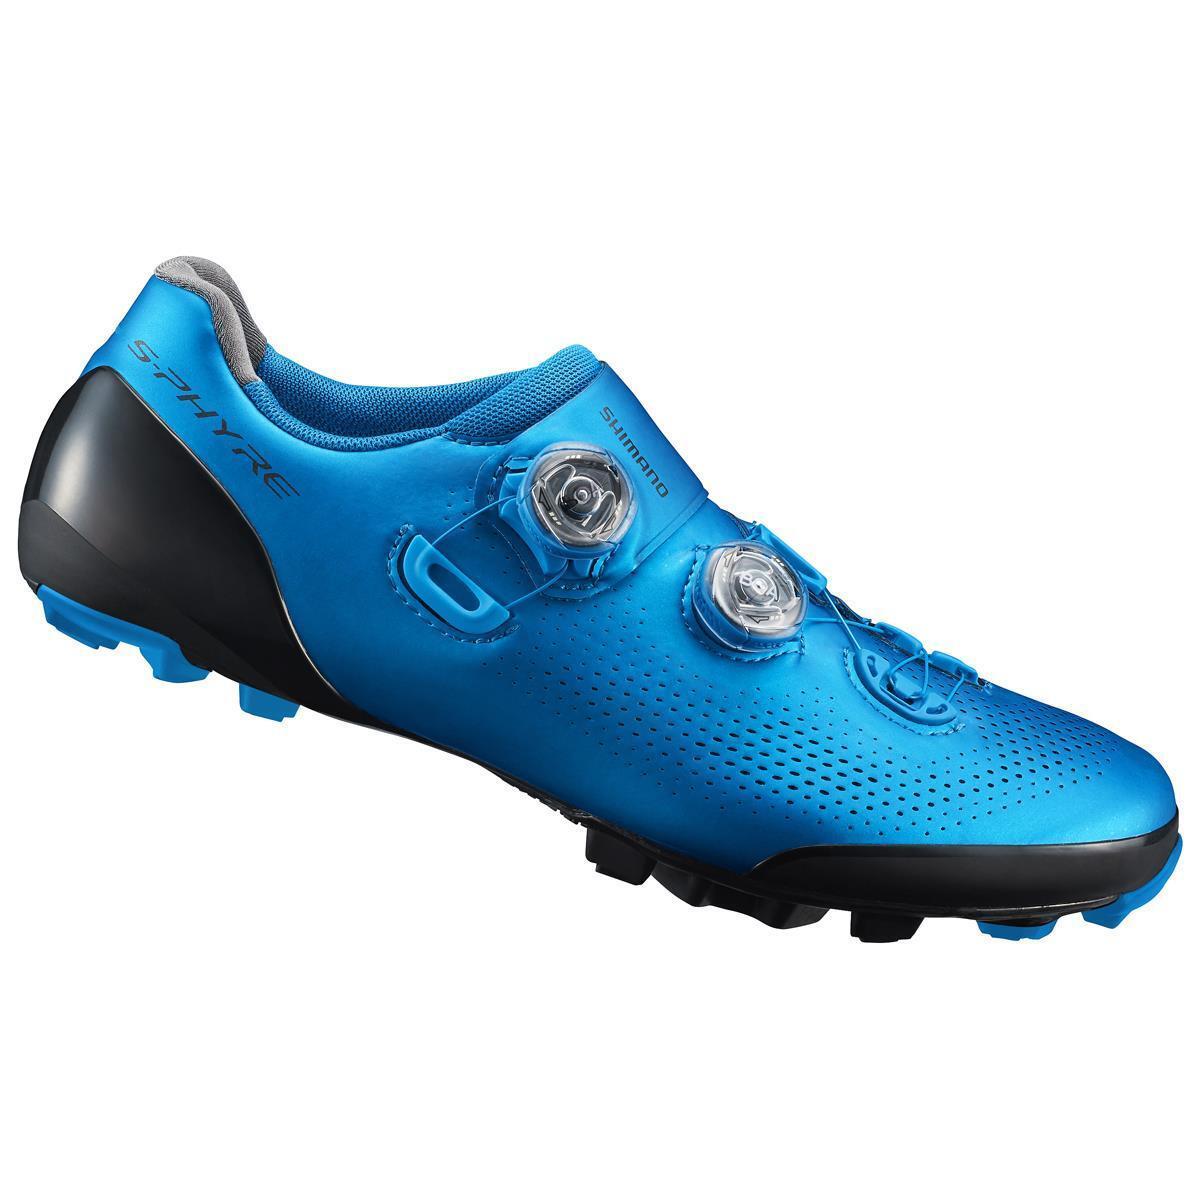 shoes mtb s-phyre xc9 sh-xc901sl1 blue 2019 SHIMANO shoes bici